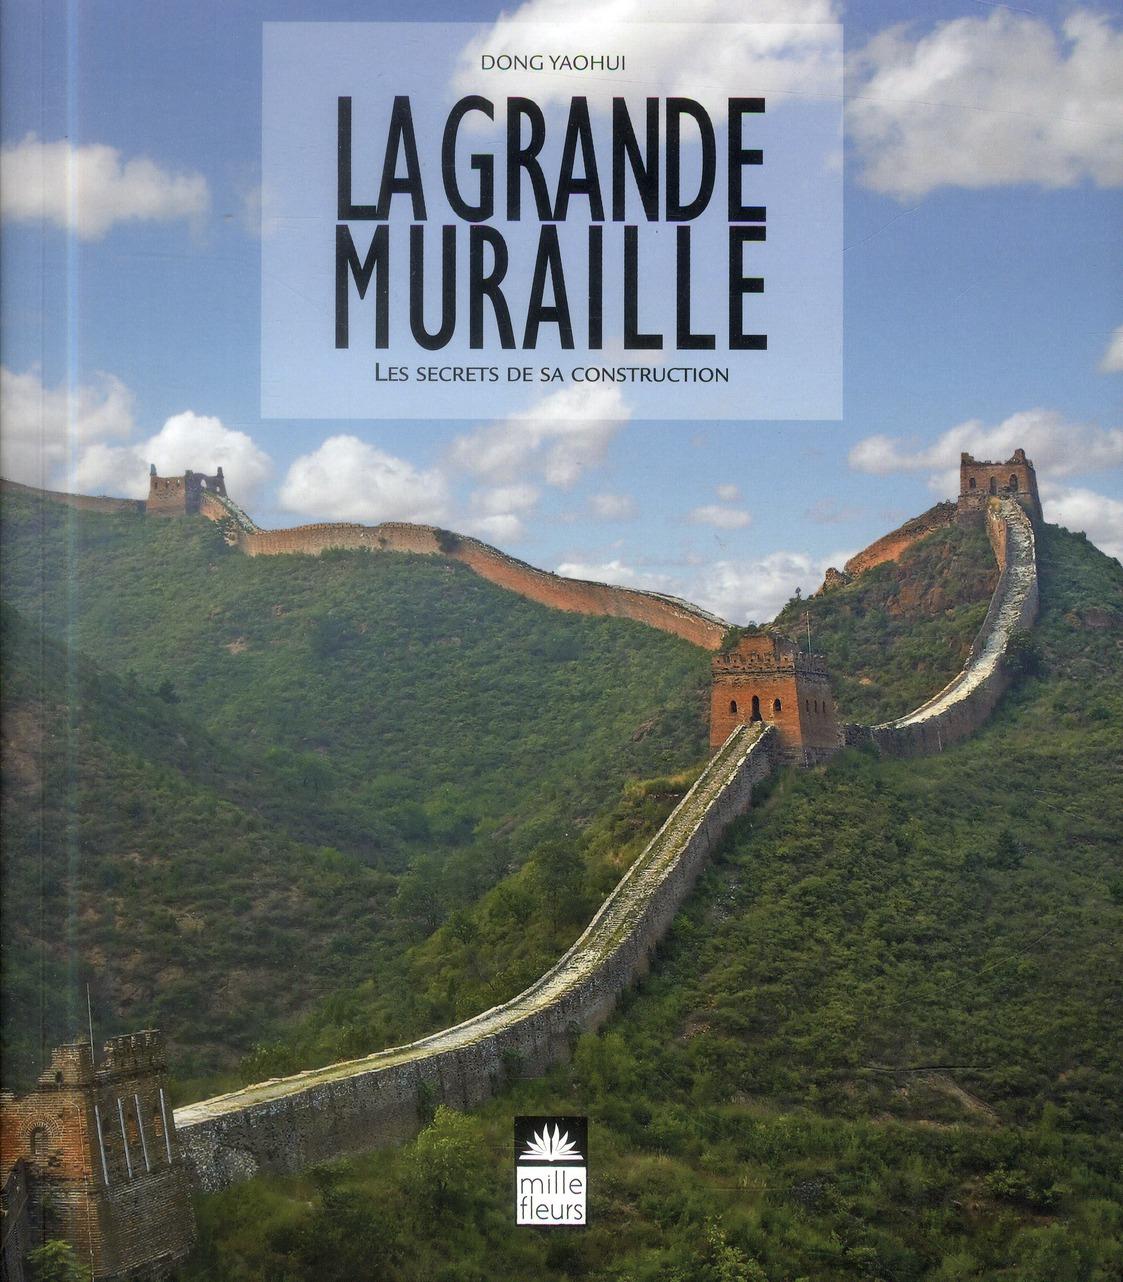 Dong Yao hui - LA GRANDE MURAILLE - LES SECRETS DE SA CONSTRUCTION